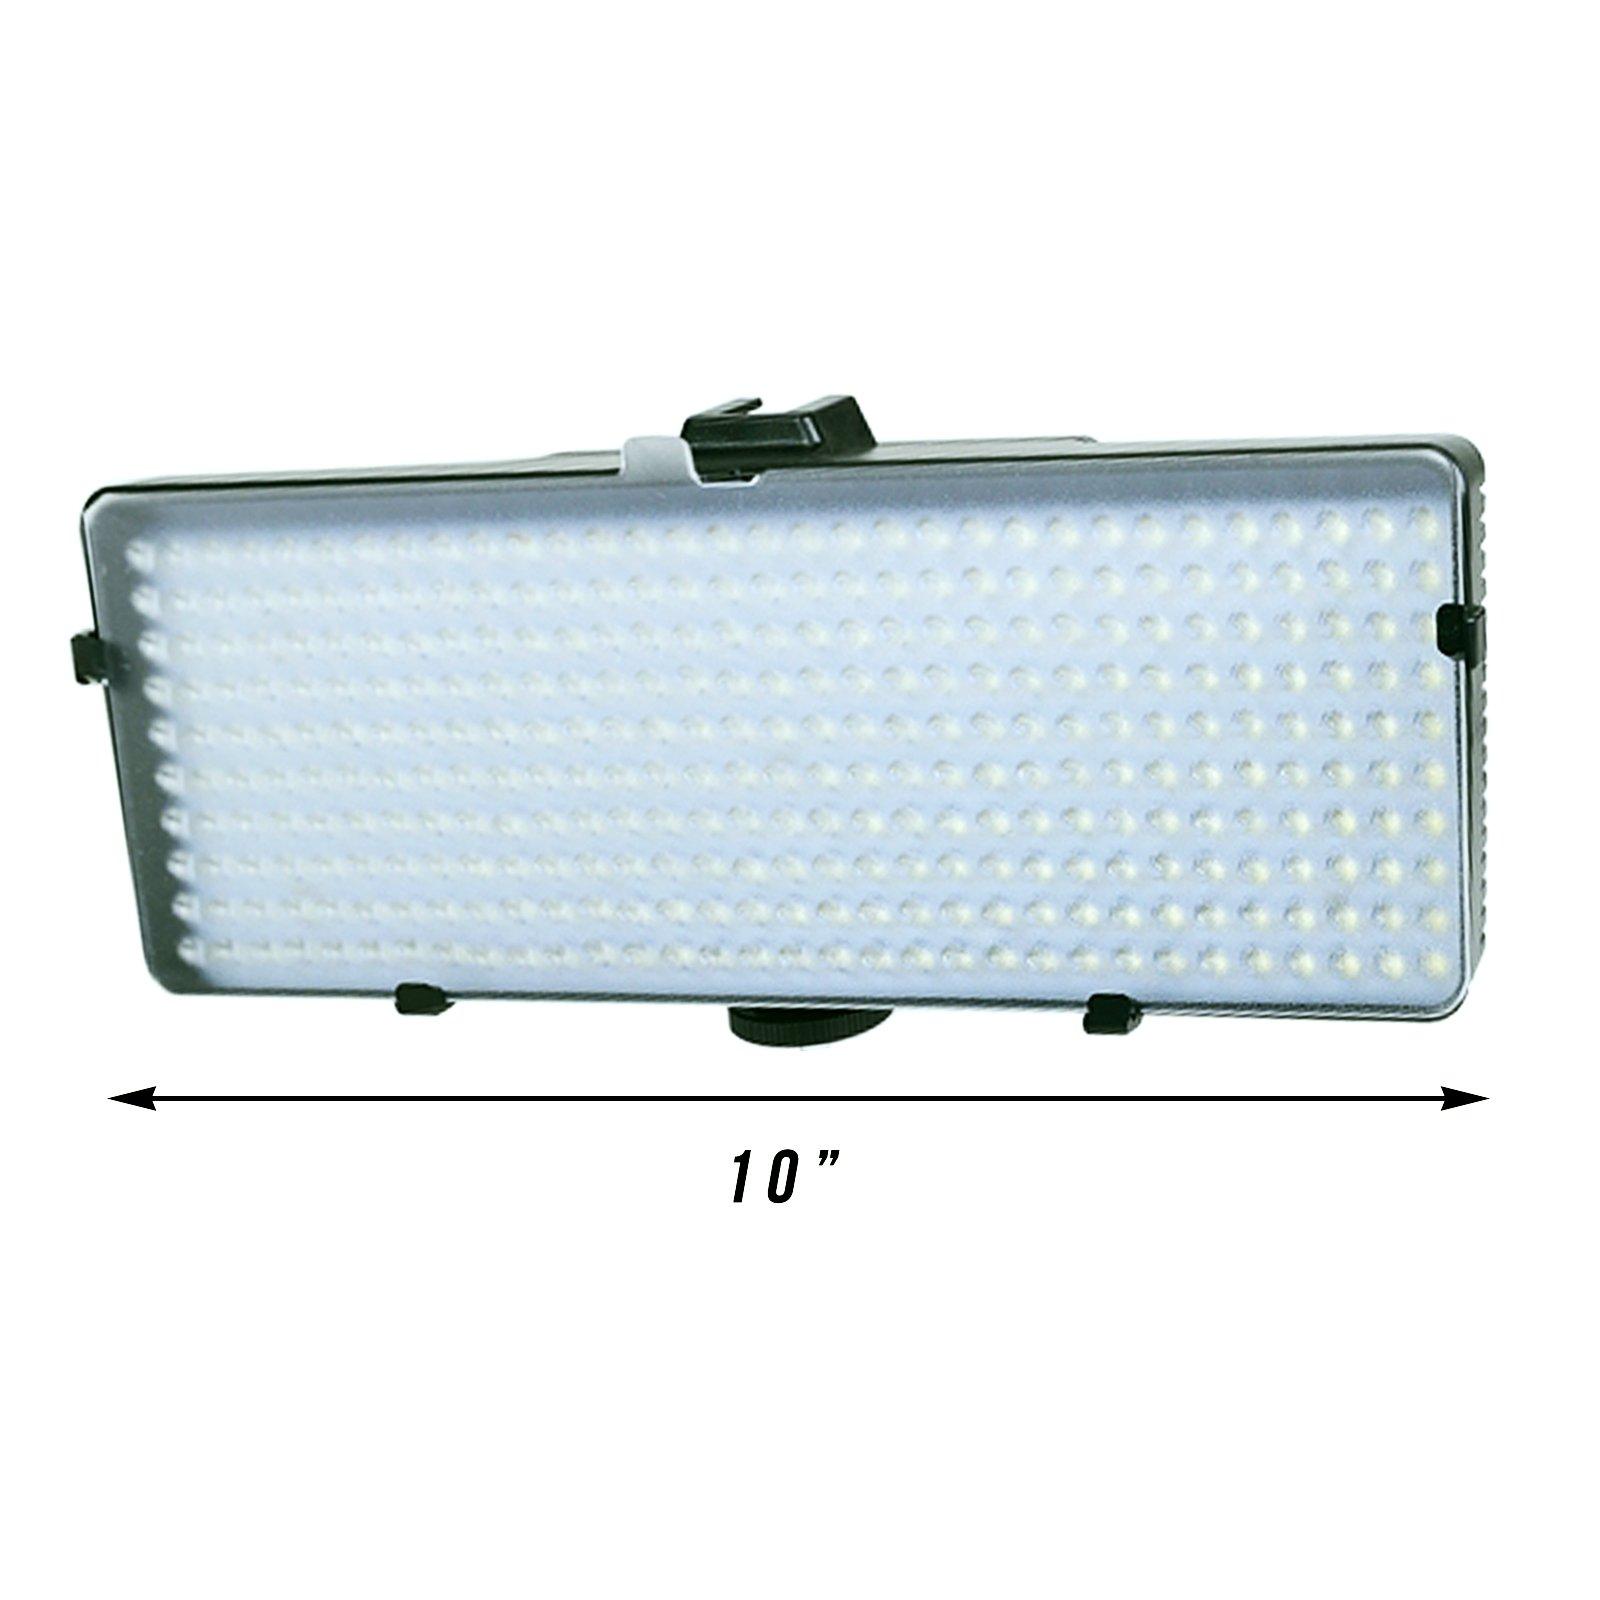 Kodak SL3200 LED Video Light Panel Photography Studio Adjustable Flicker Free